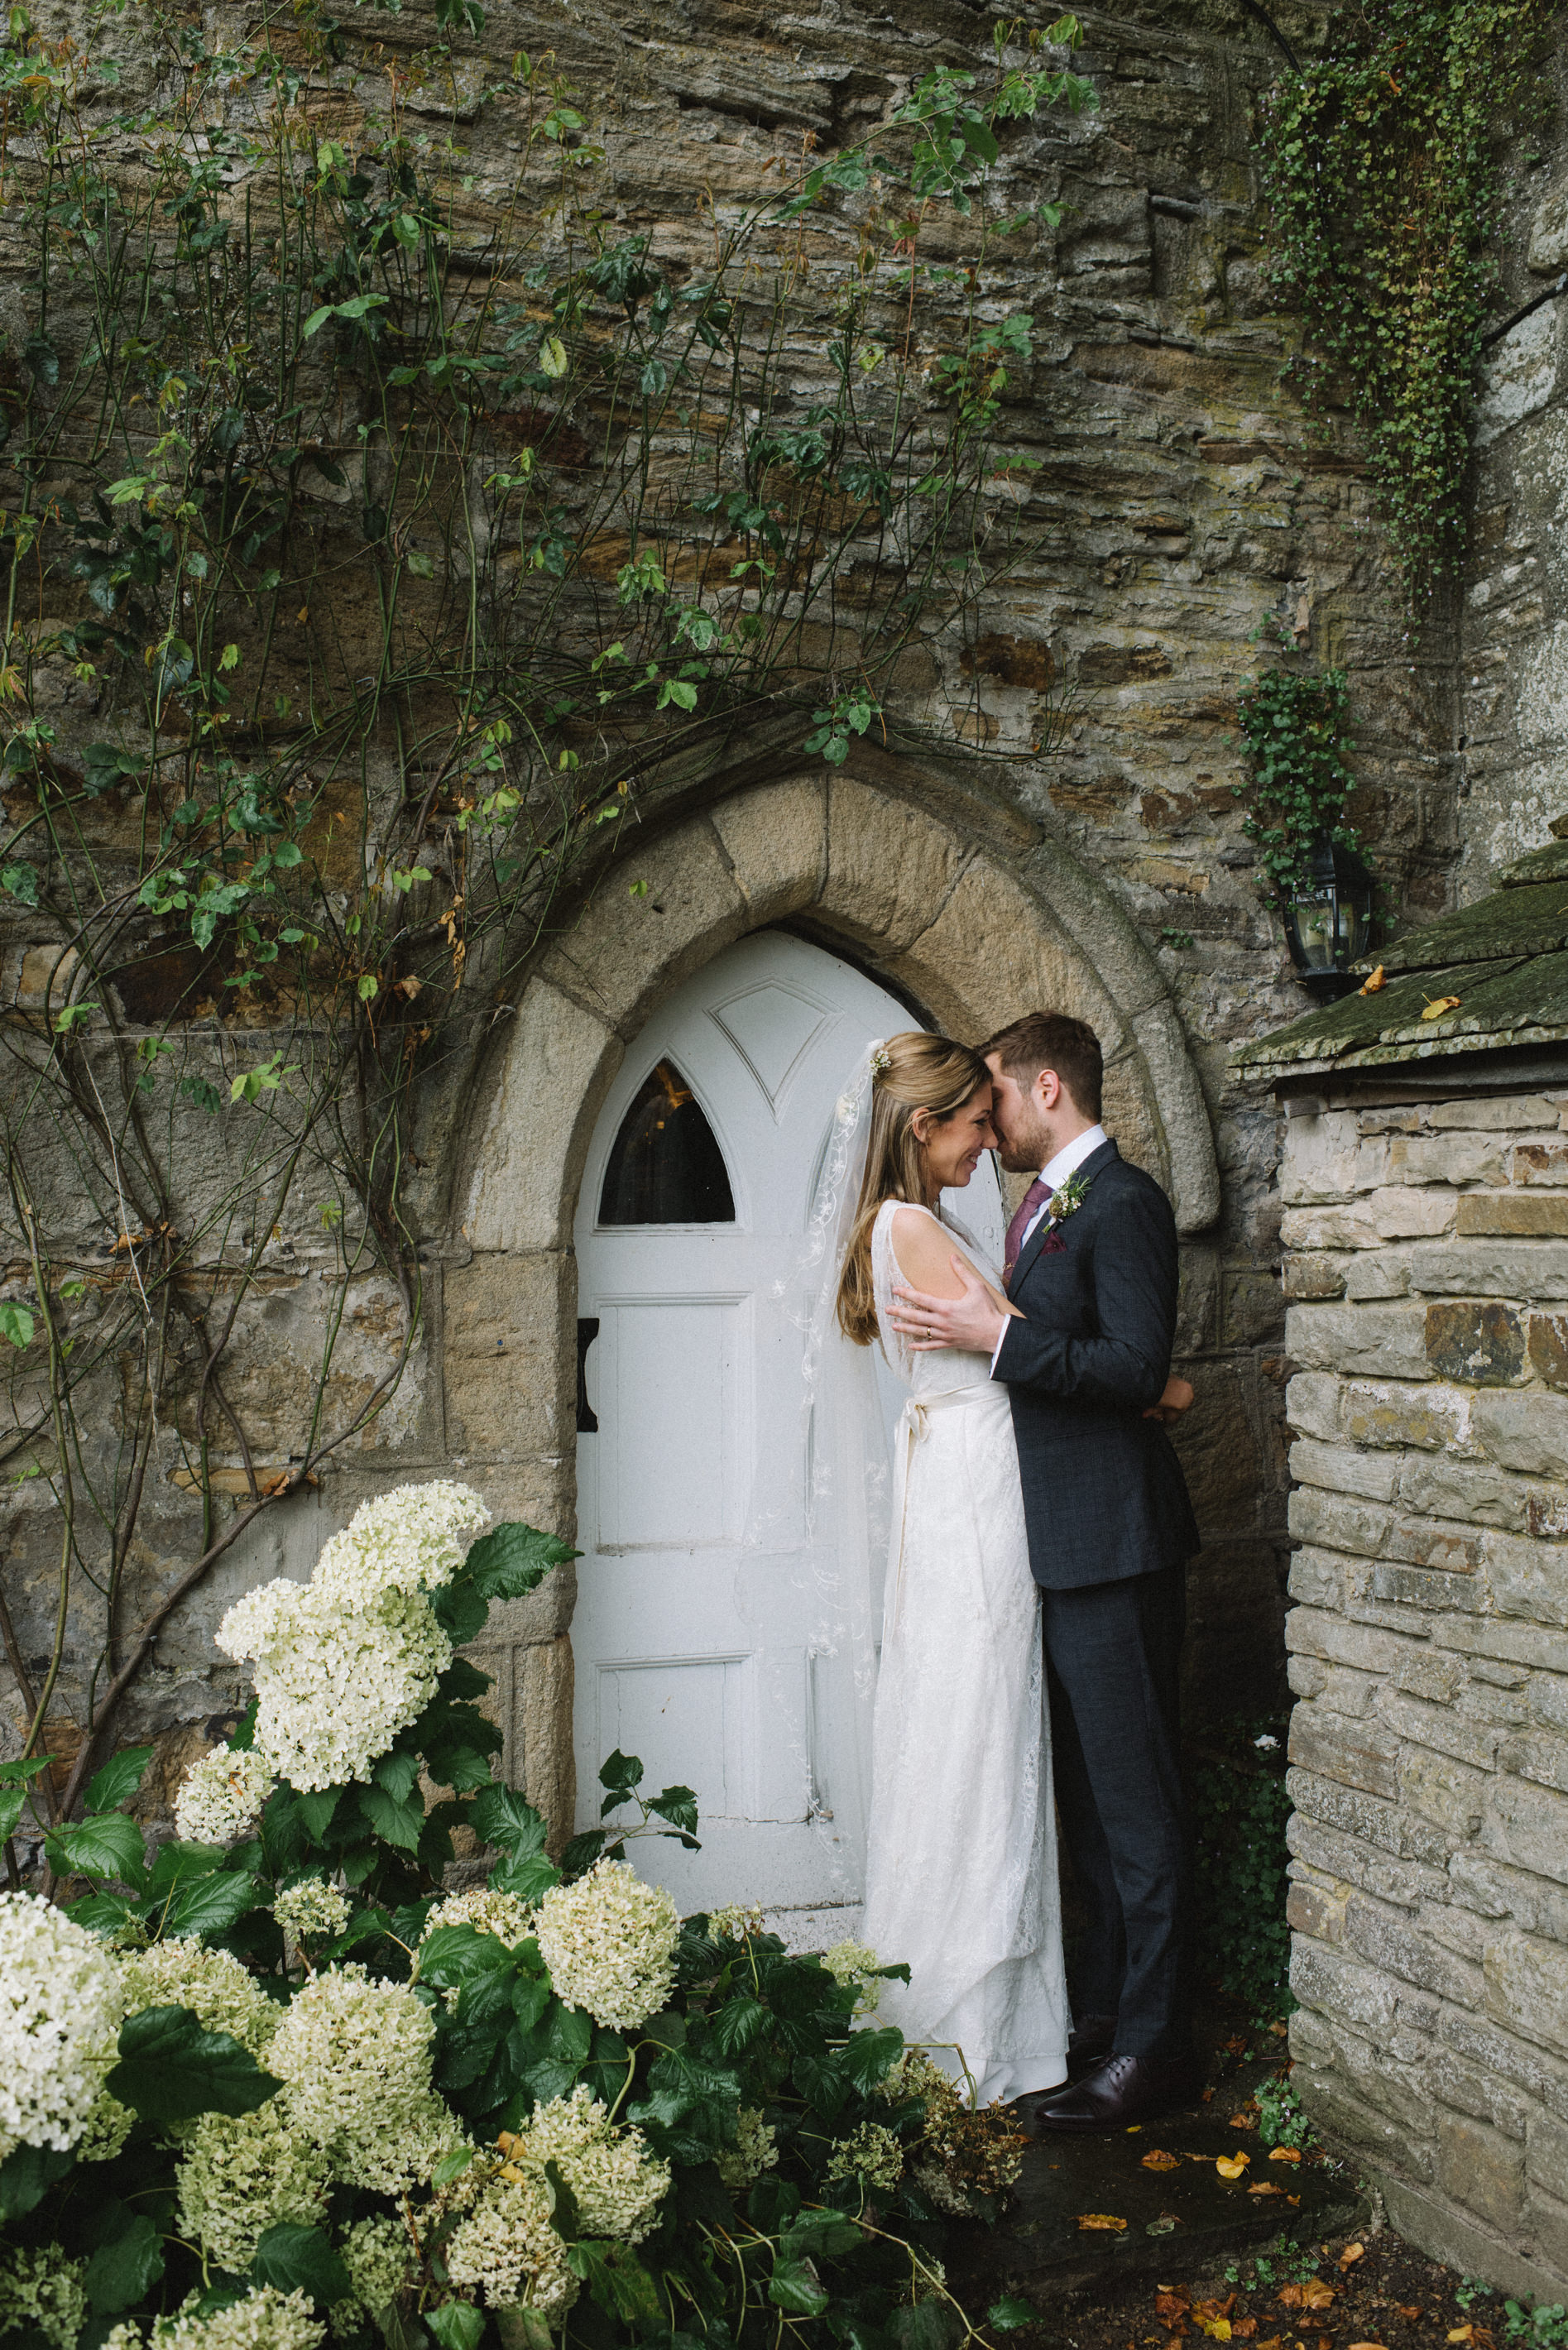 0239-LISA-DEVINE-PHOTOGRAPHY-ALTERNATIVE-WEDDING-PHOTOGRAPHY-SCOTLAND-DESTINATION-WEDDINGS-GLASGOW-WEDDINGS-COOL-WEDDINGS-STYLISH-WEDDINGS.JPG